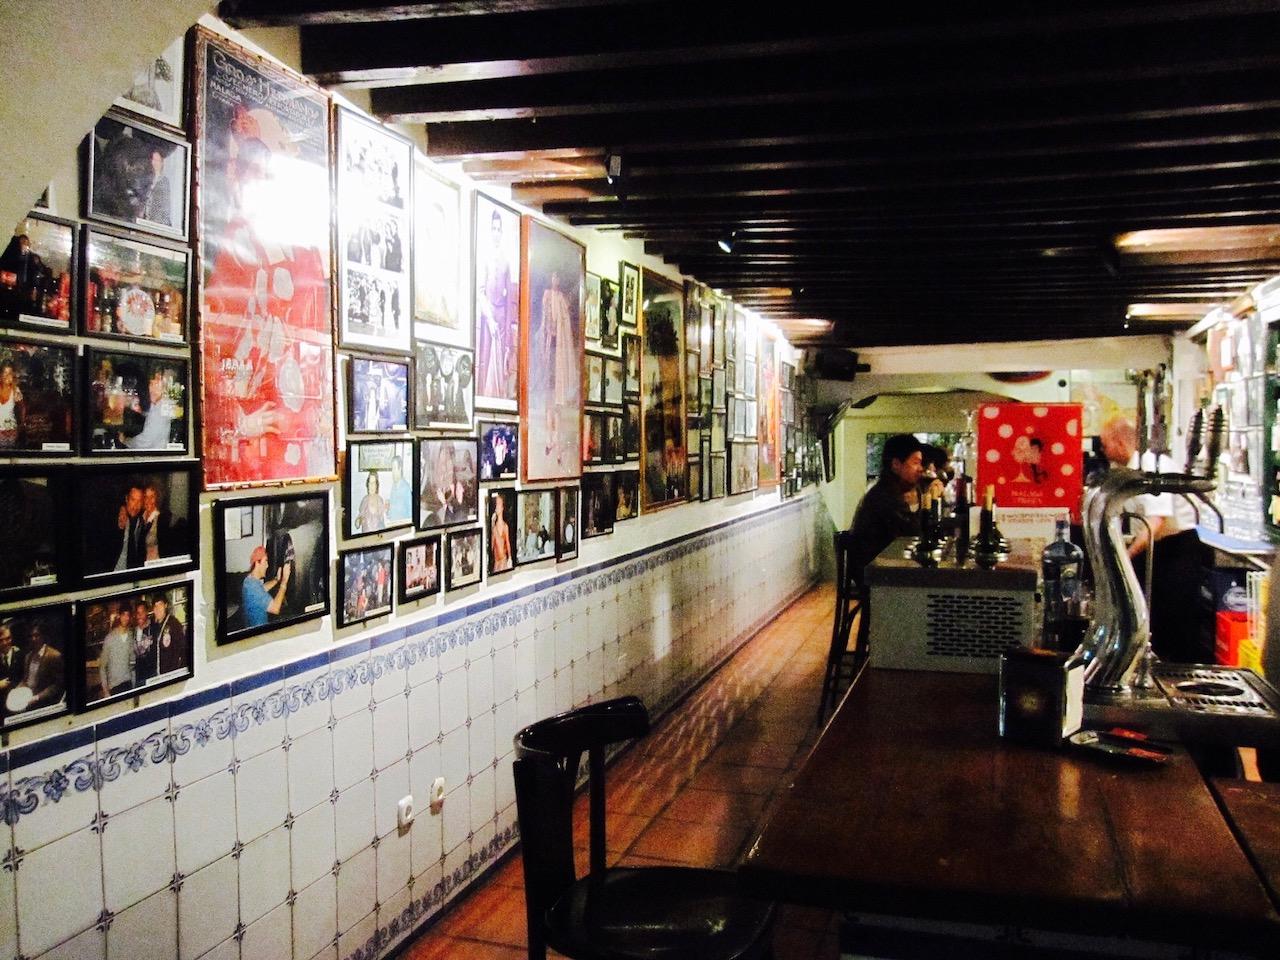 Bodega Bar El Pimpi, Malaga, Andalusien